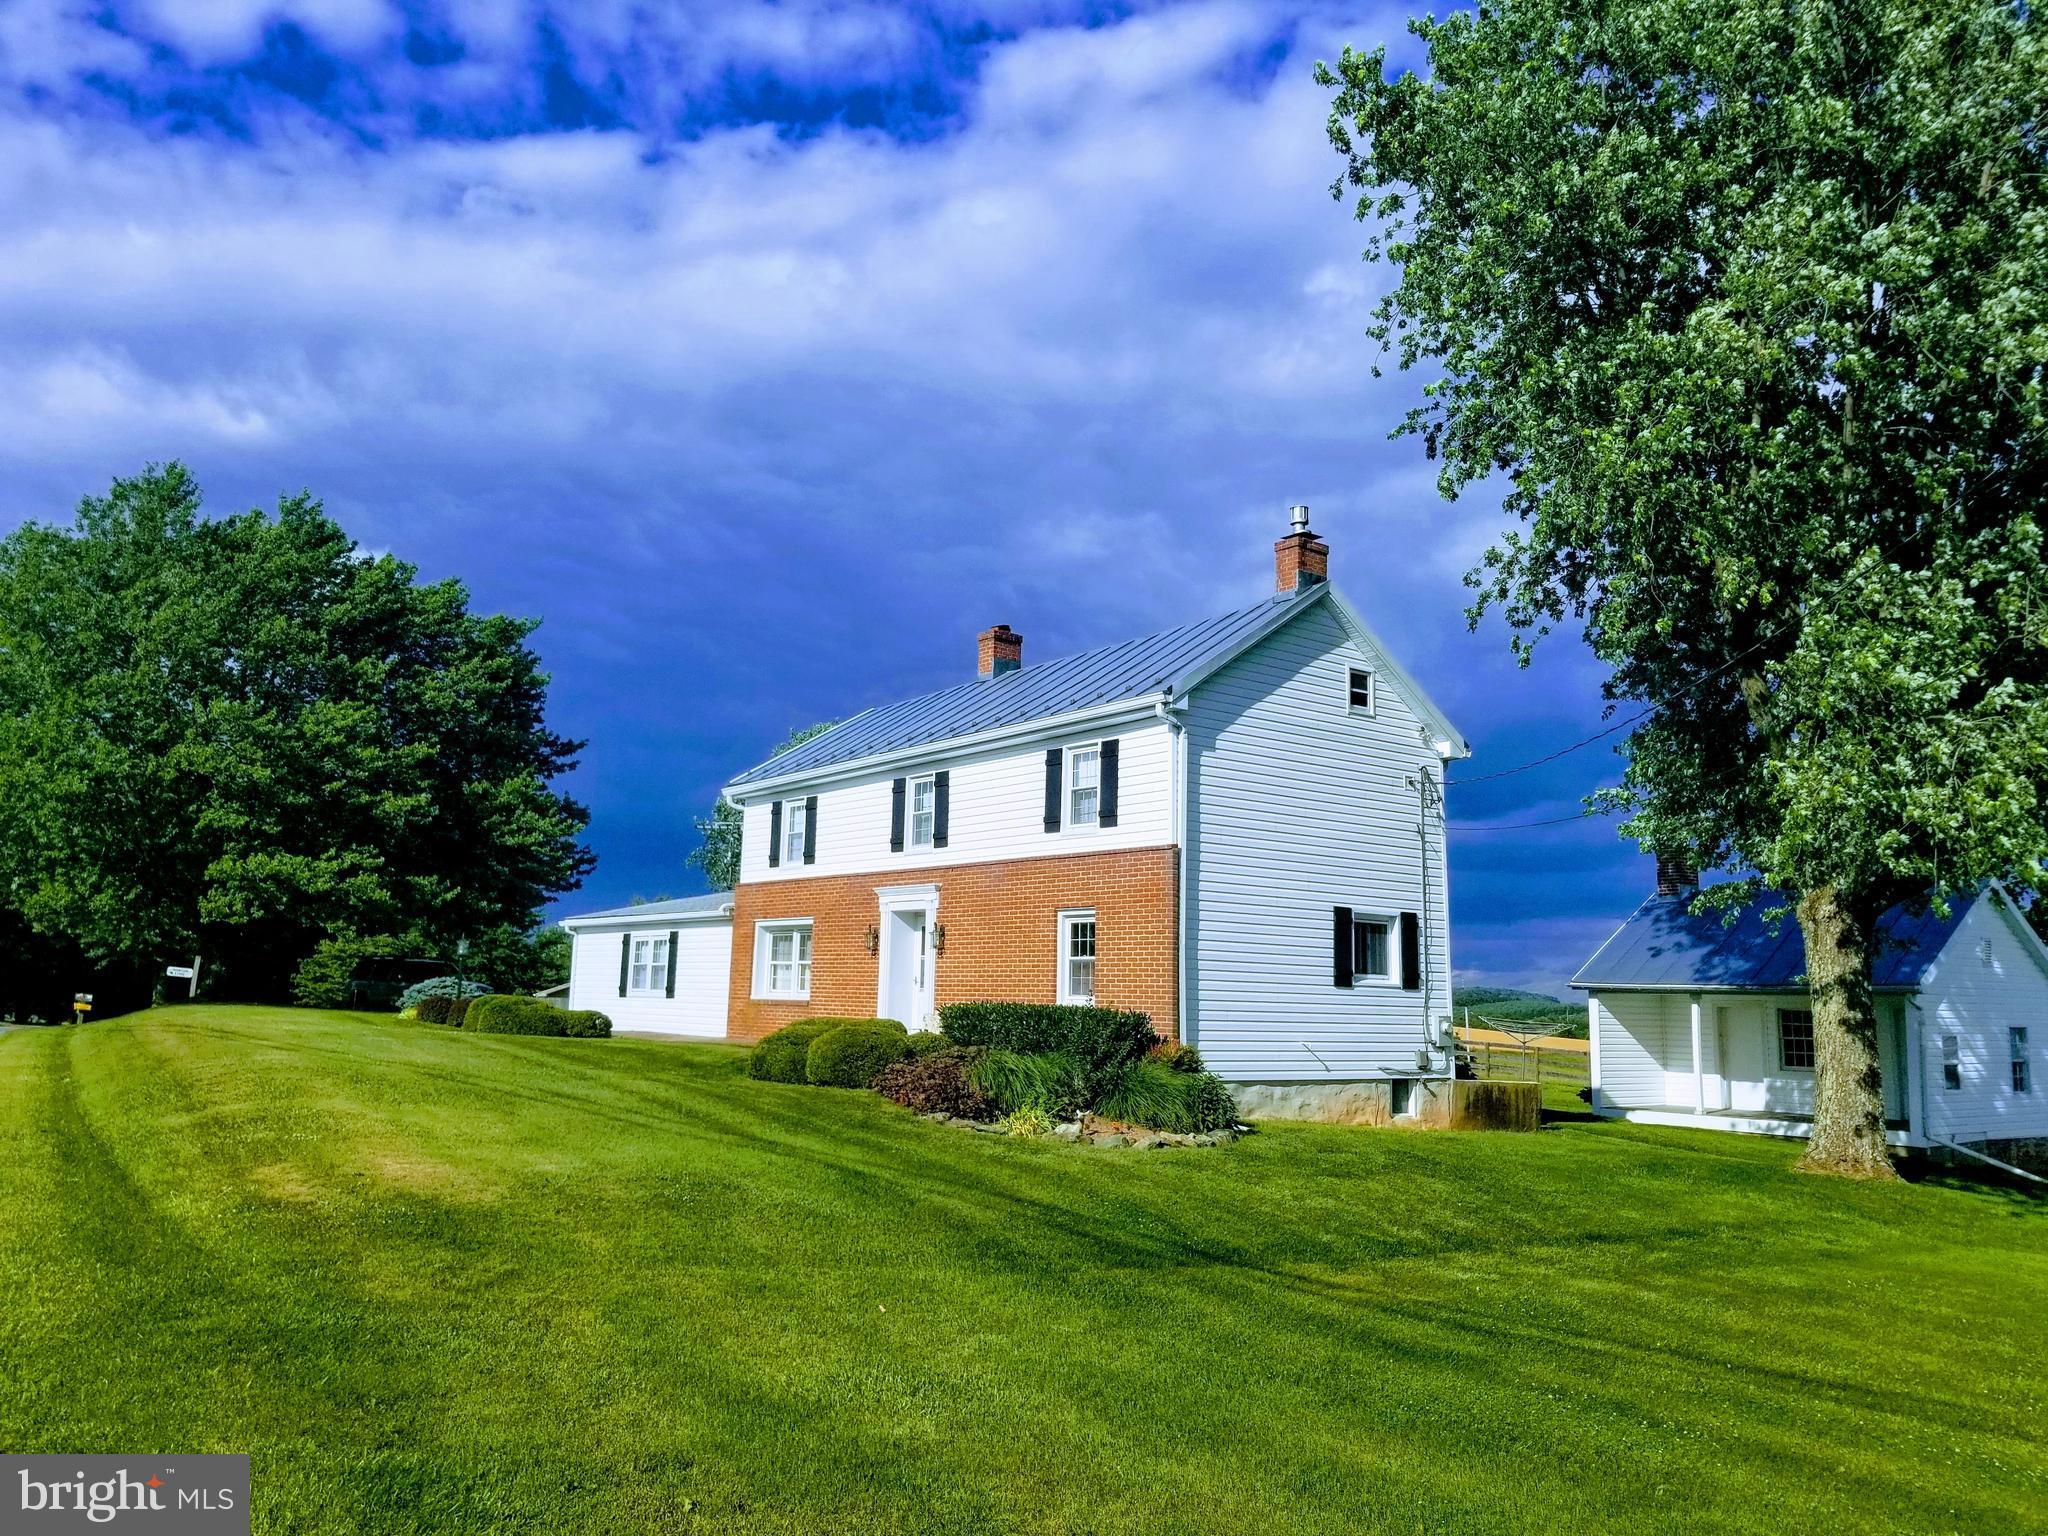 1745 DENNINGS ROAD, NEW WINDSOR, MD 21776